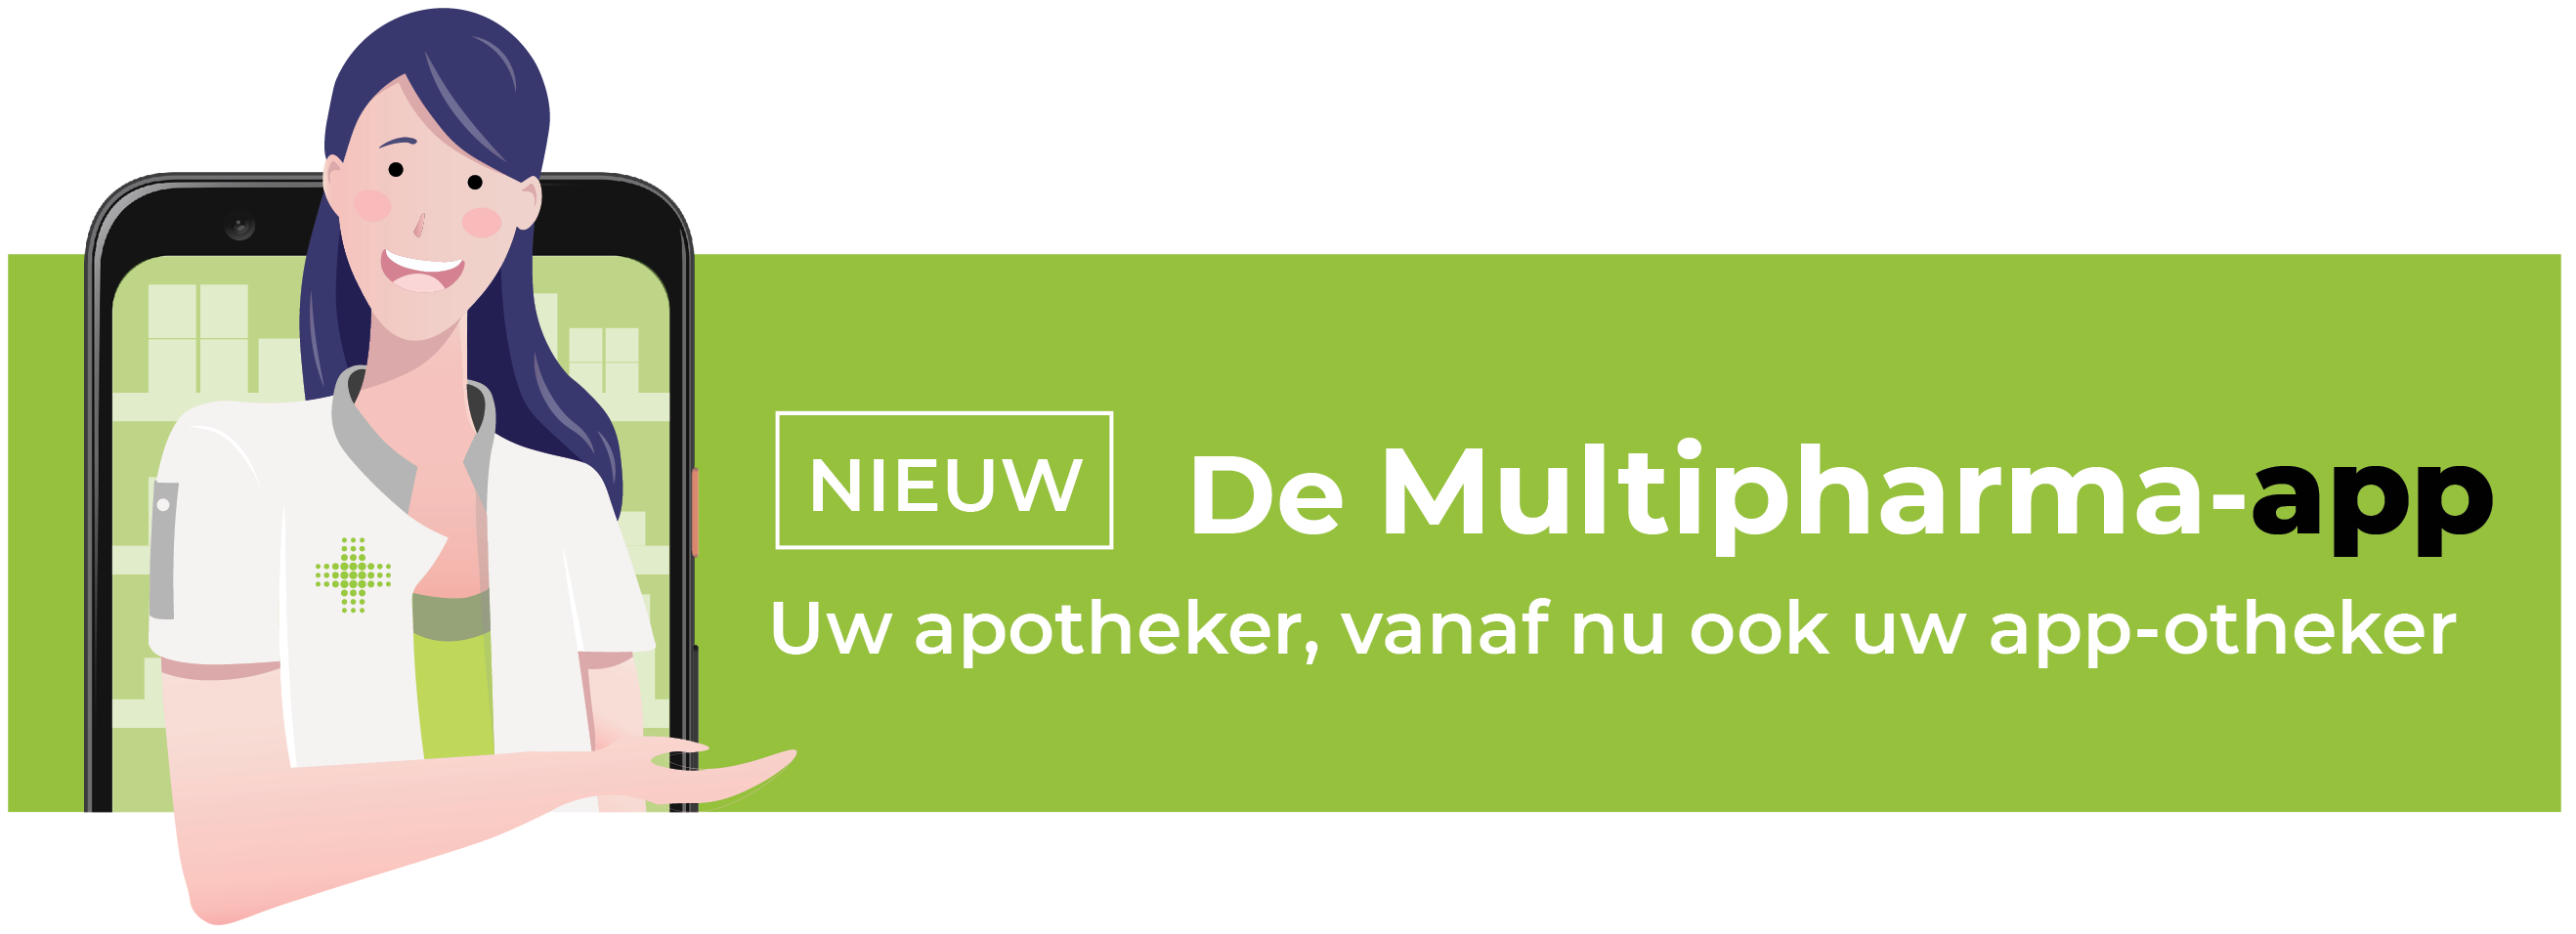 De Multipharma-app